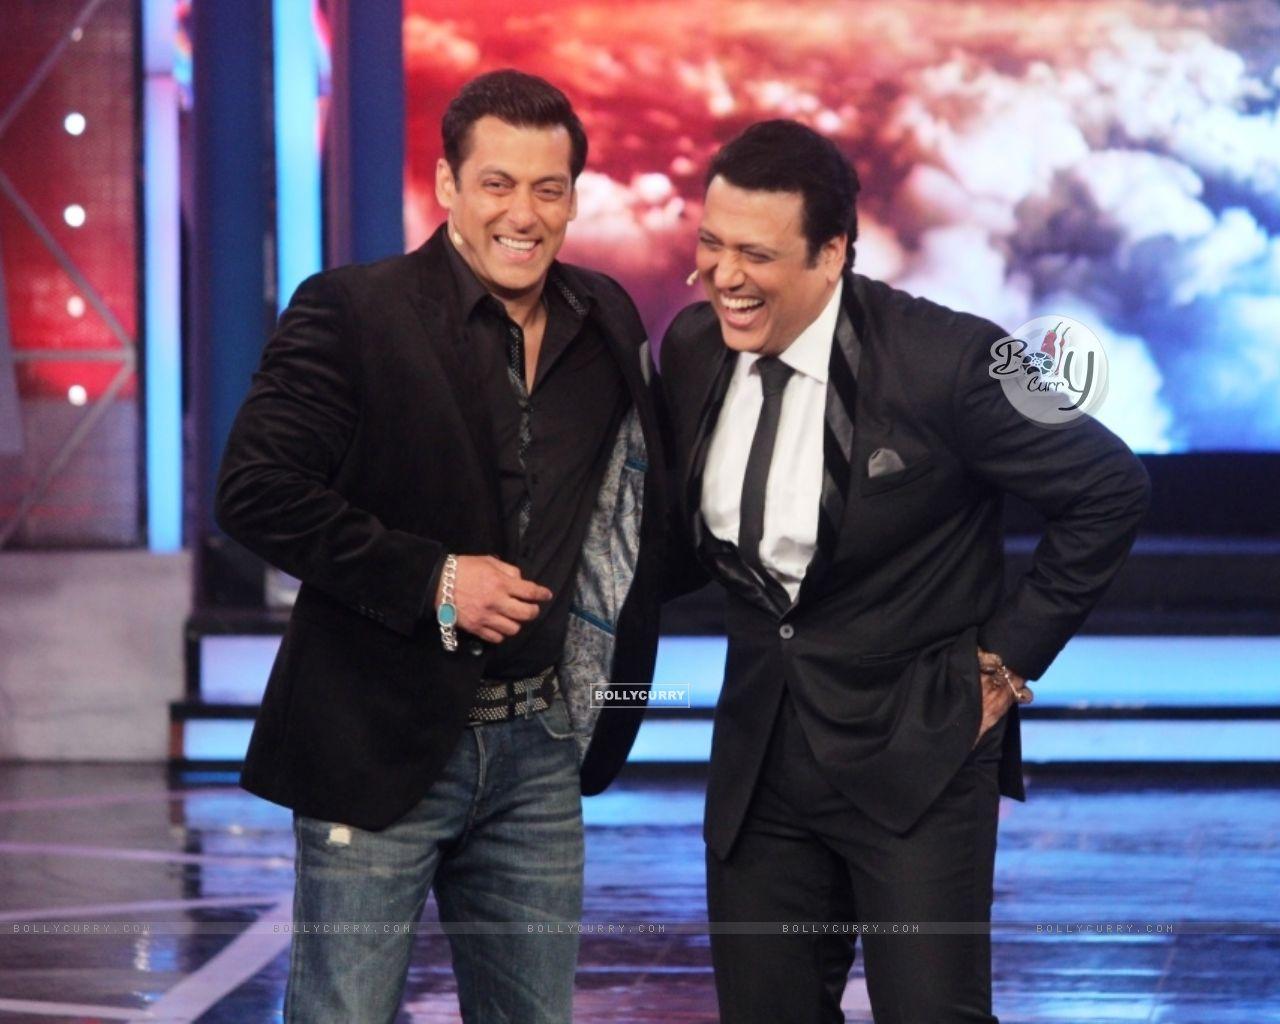 Salman Khan and Govinda on Bigg Boss 8 (342926) size:1280x1024